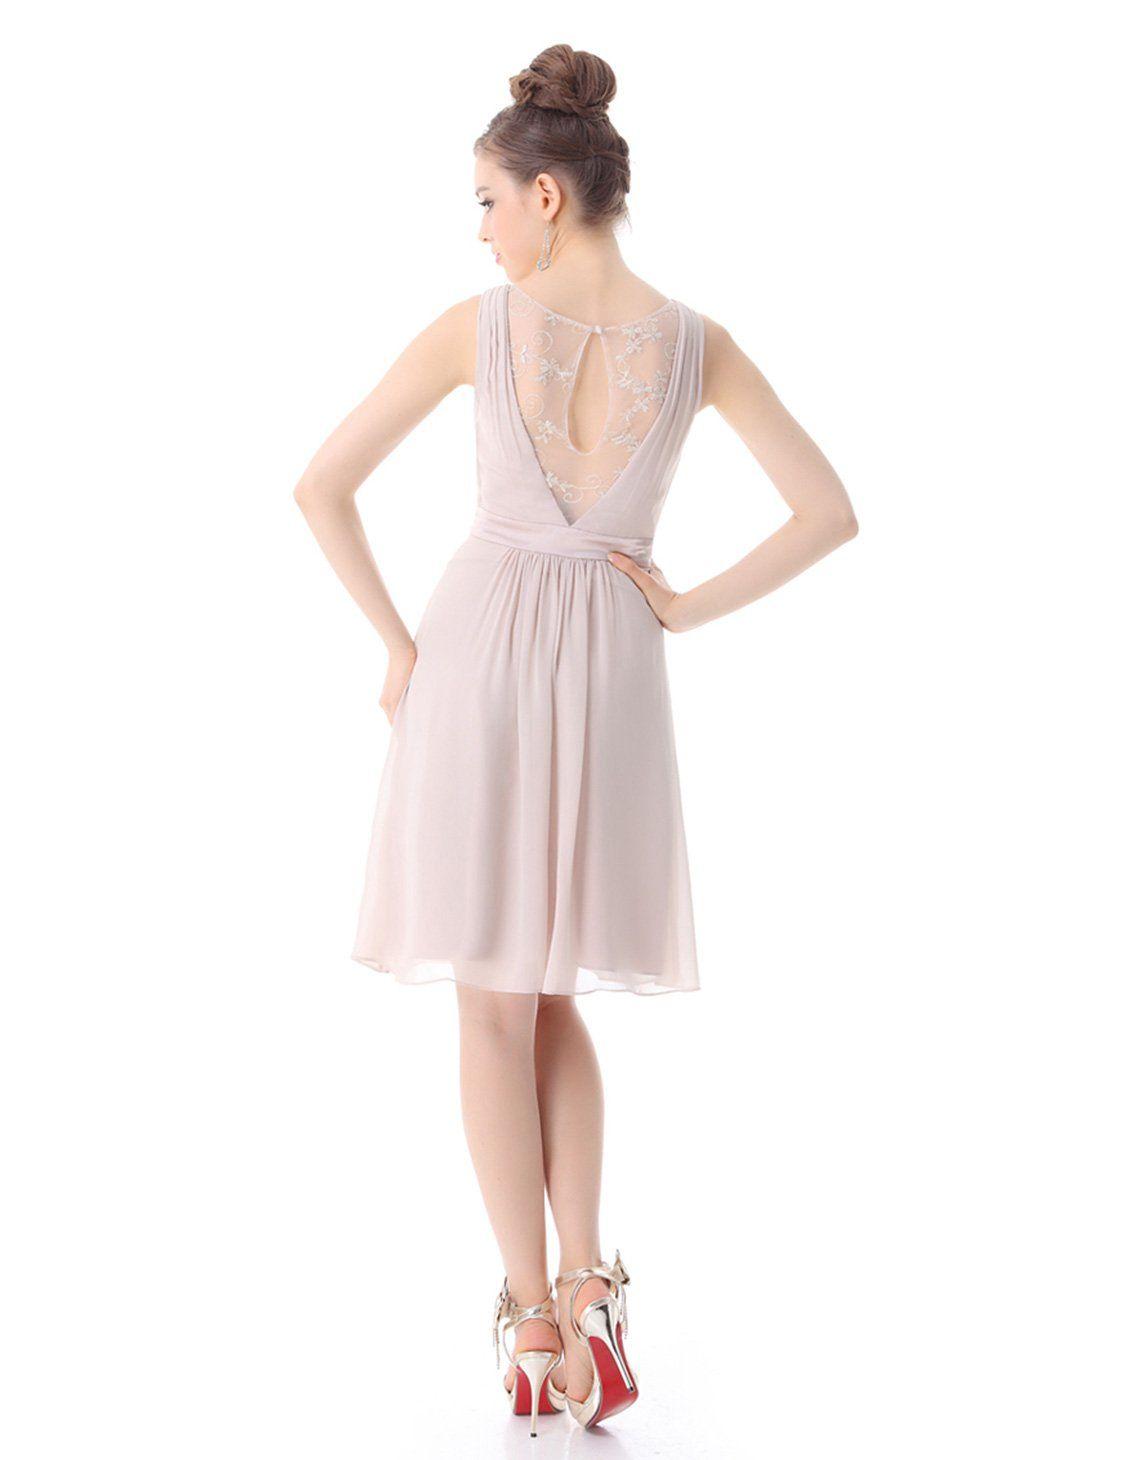 Alisa Pan Womens Short Vneck Wedding Guest Dress 10 Us Khaki Want